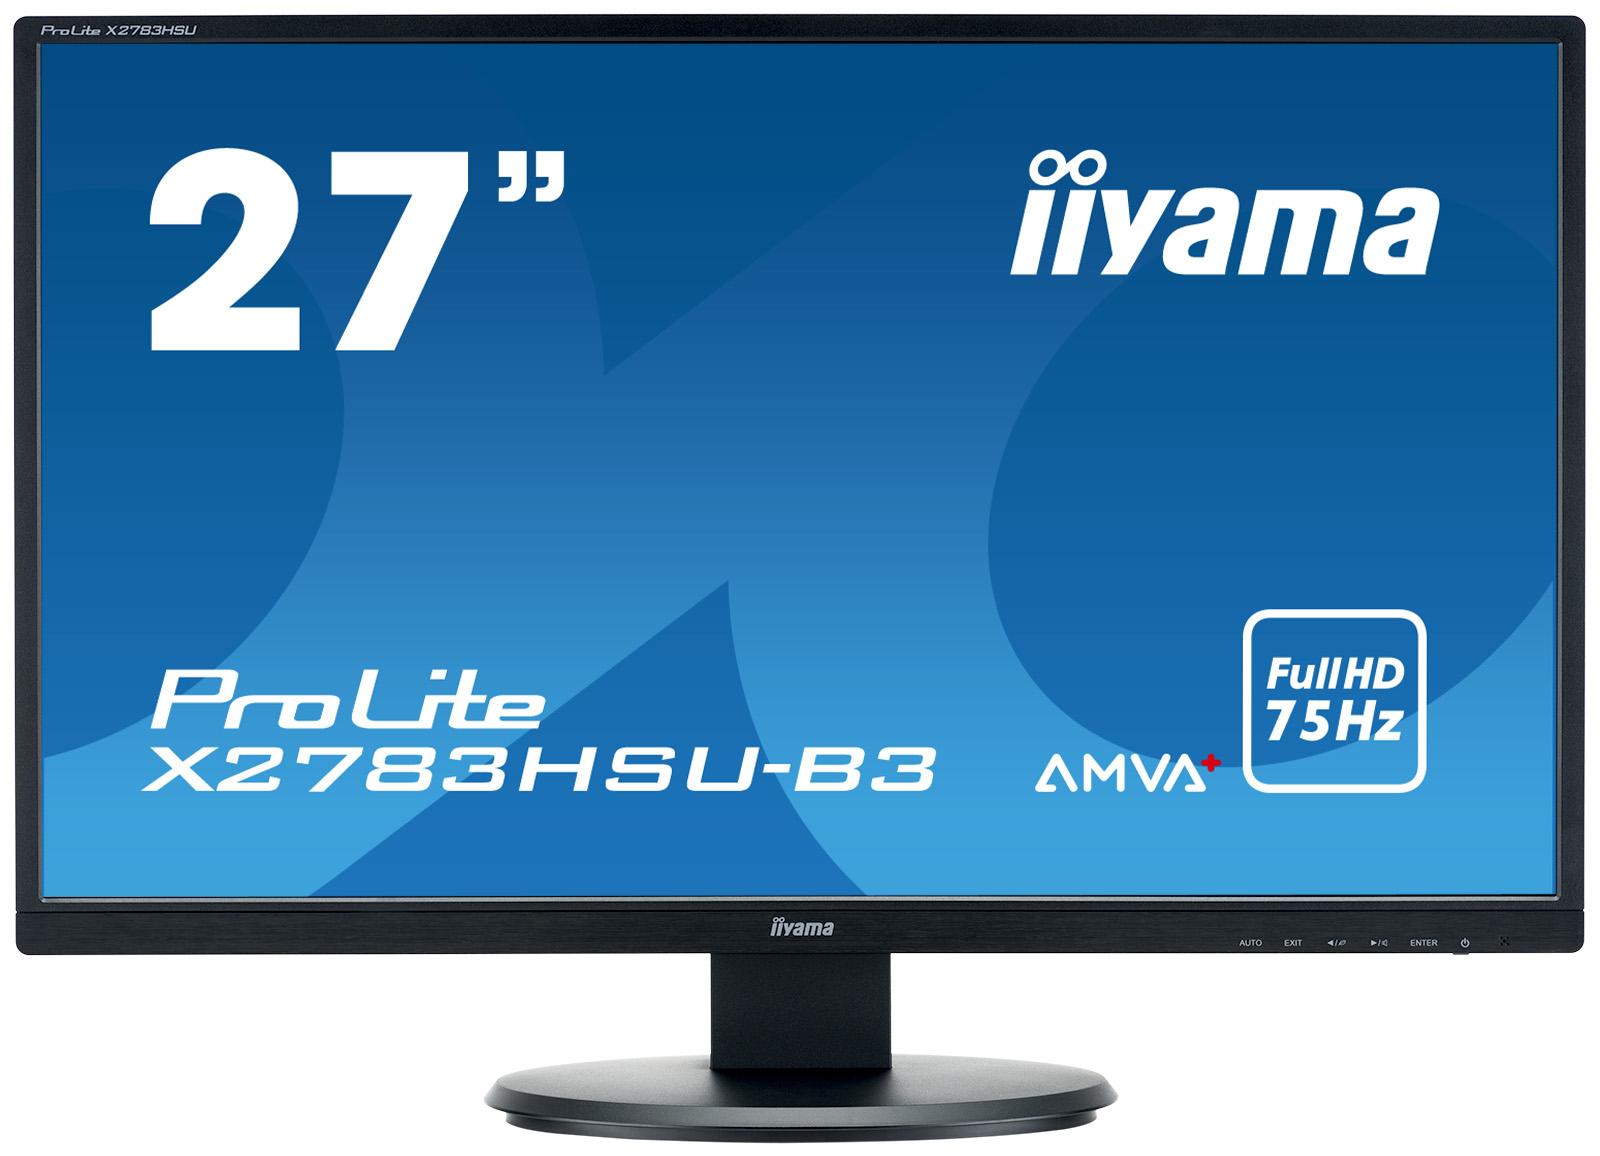 Iiyama LCD X2783HSU 27'' LED, AMVA+, 4ms, VGA/HDMI, USB, repro, 1920x1080, č